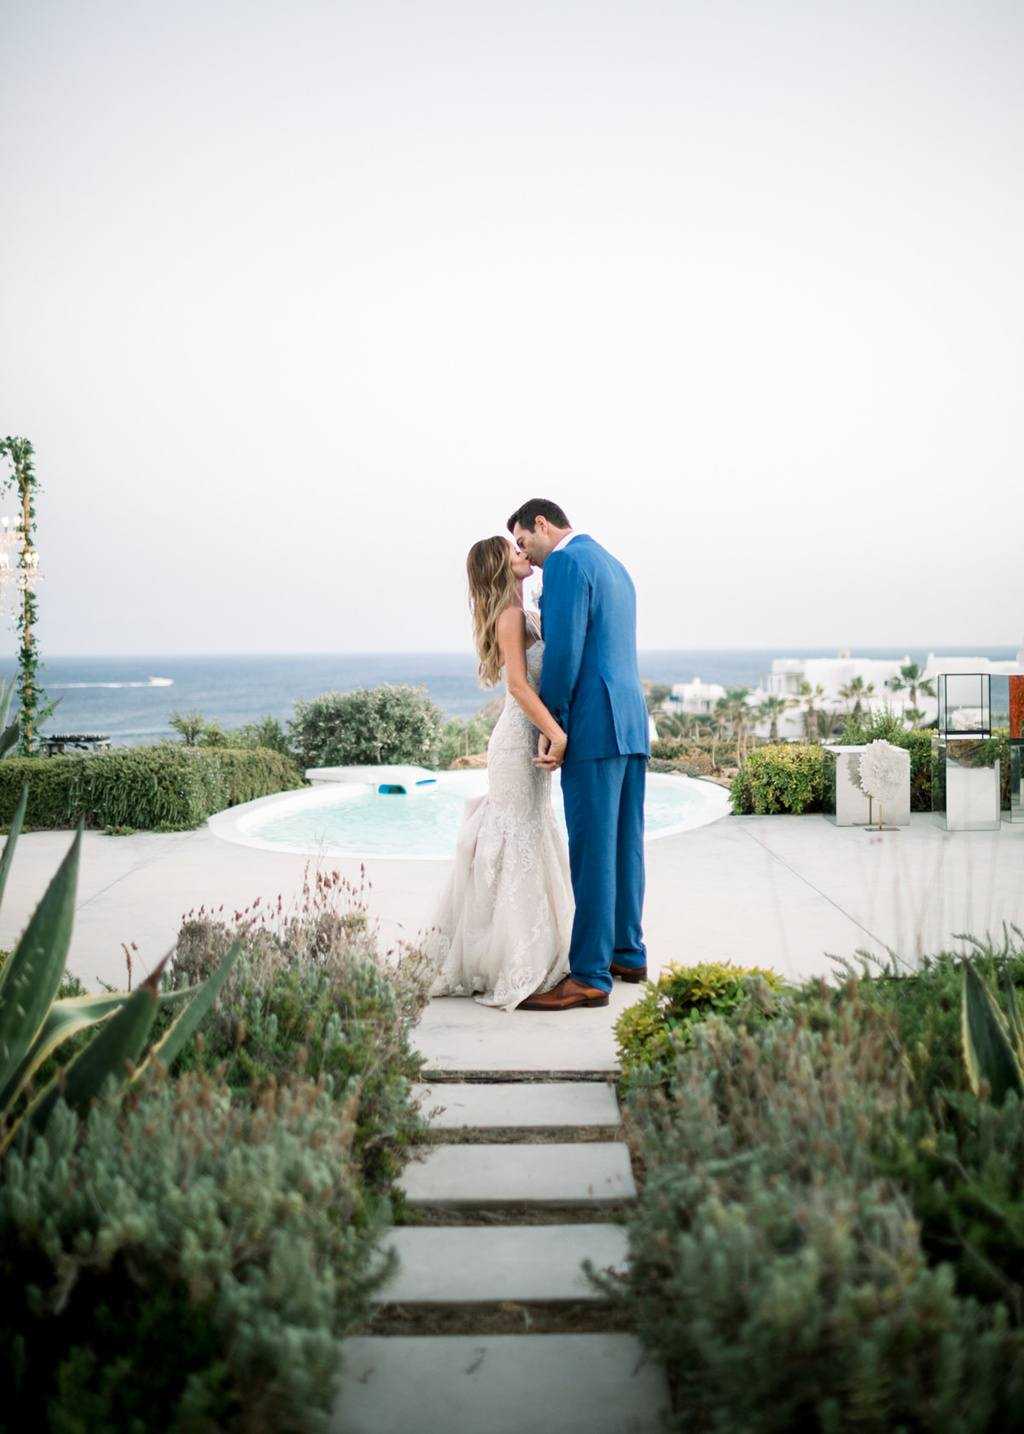 Destination Wedding Private Viilla Mykonos 33